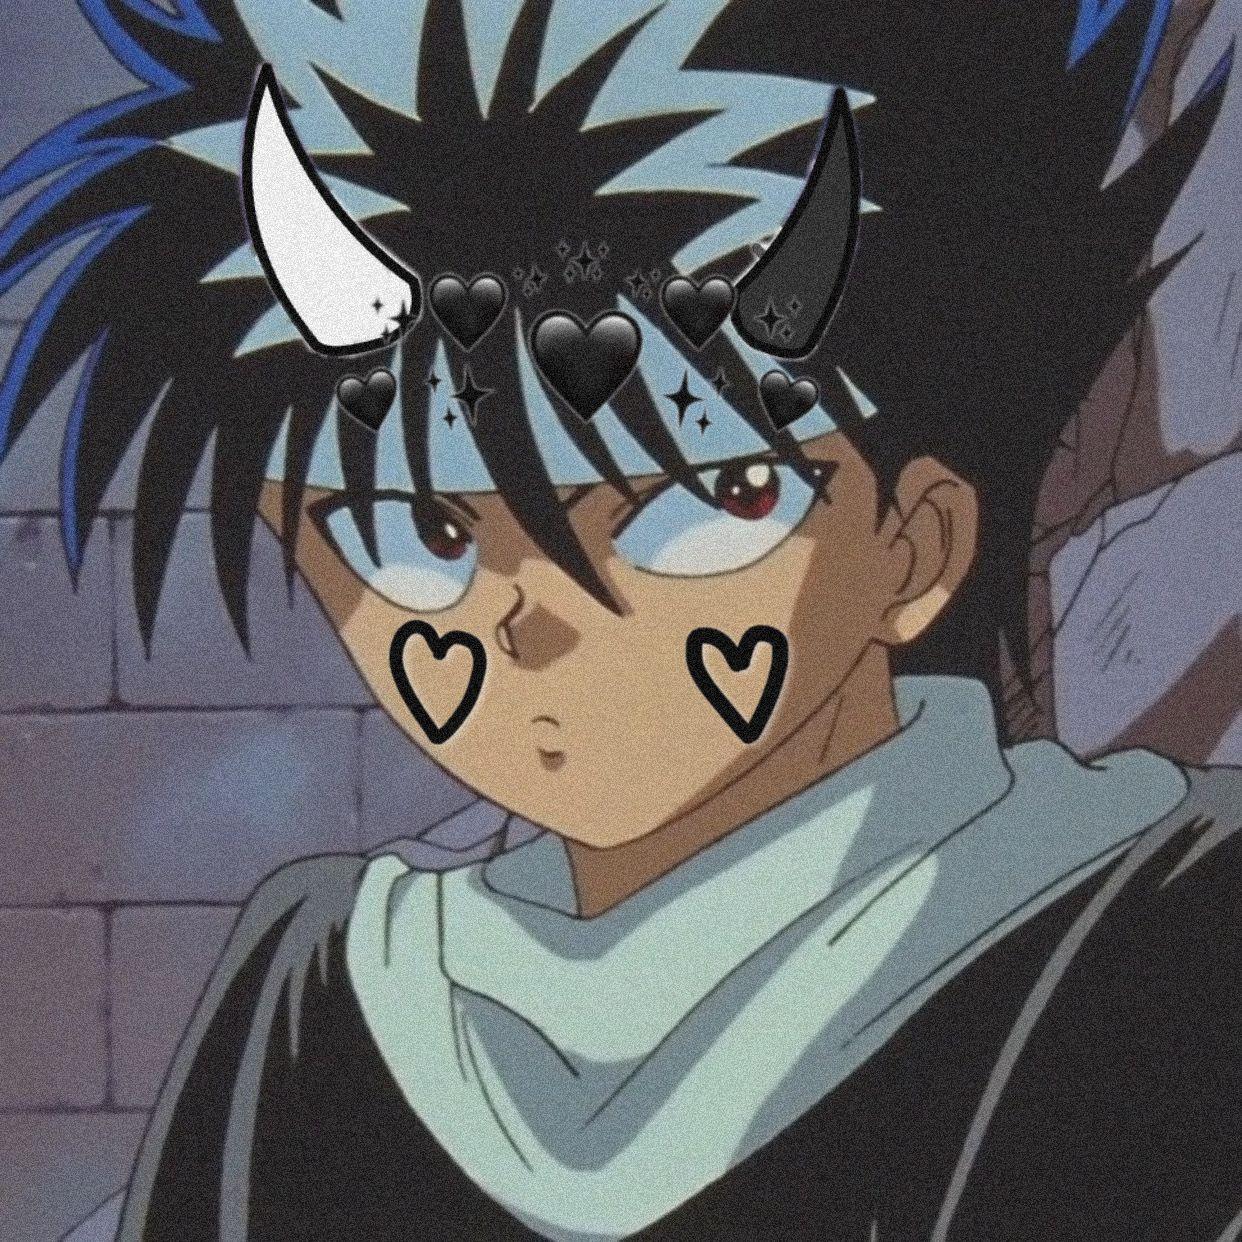 Pin on Anime aesthetics icons